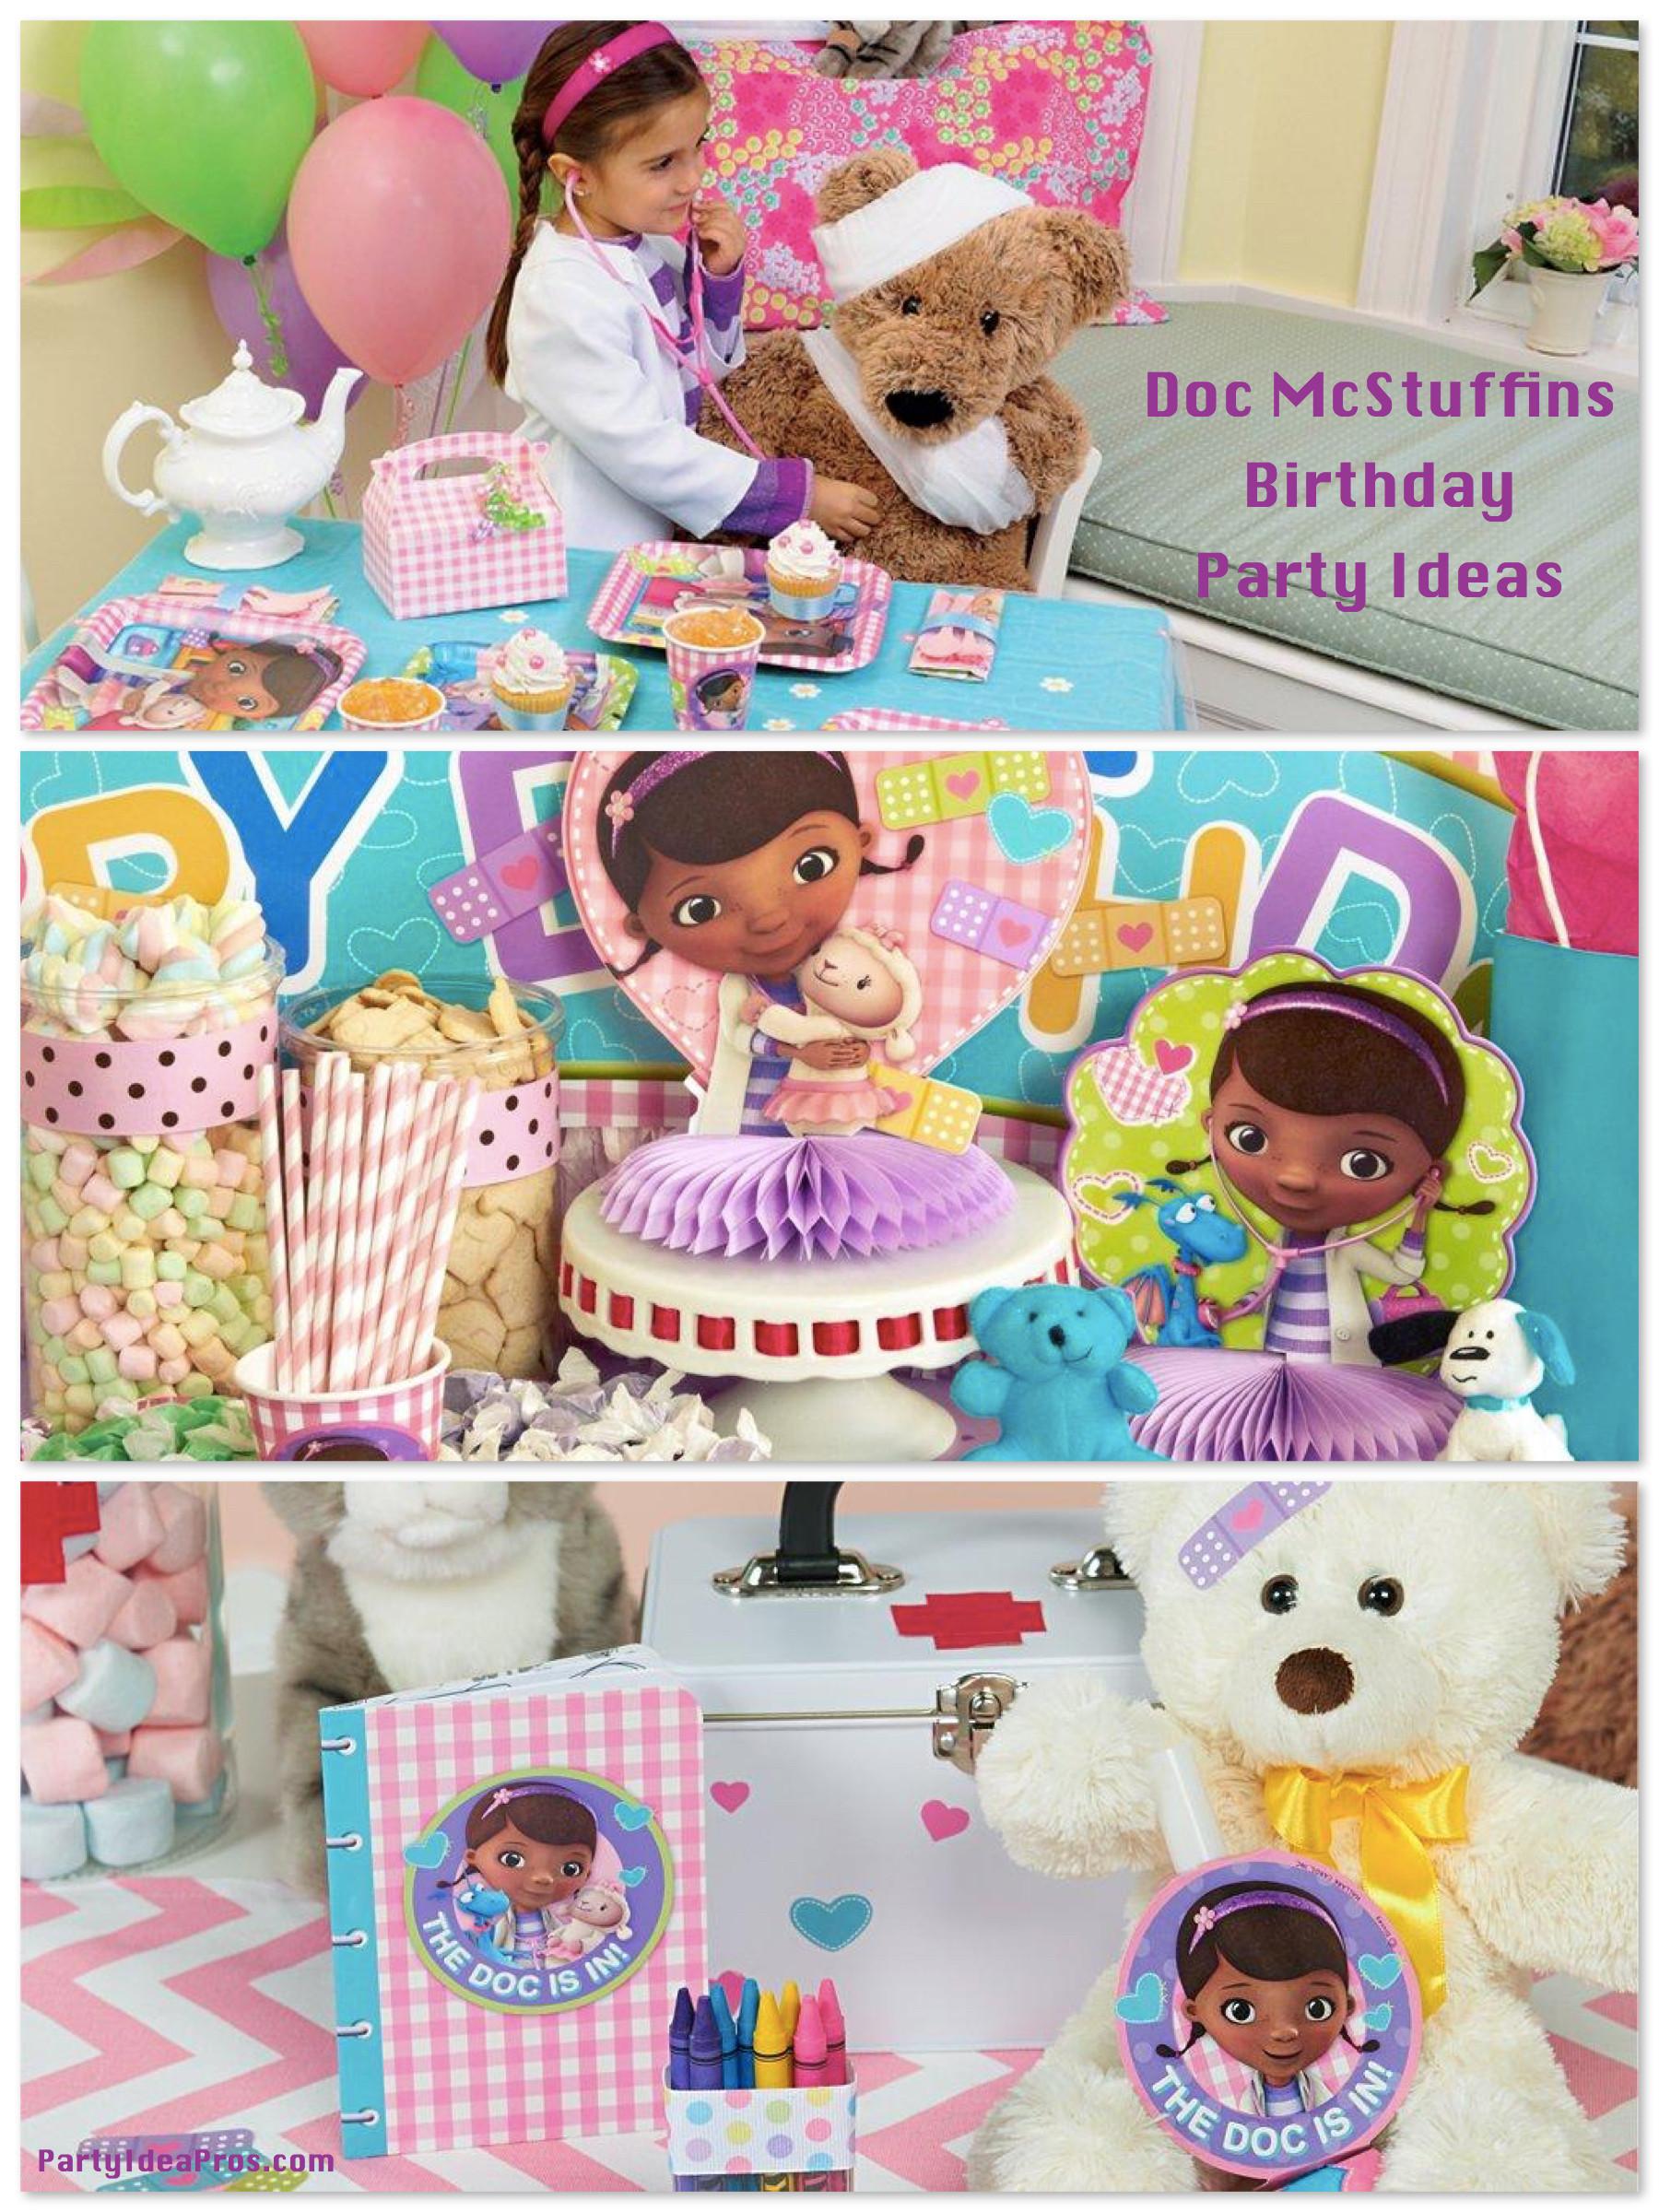 Best ideas about Doc Mcstuffins Birthday Party Ideas . Save or Pin Doc McStuffins Birthday Party Planning Ideas & Supplies Now.